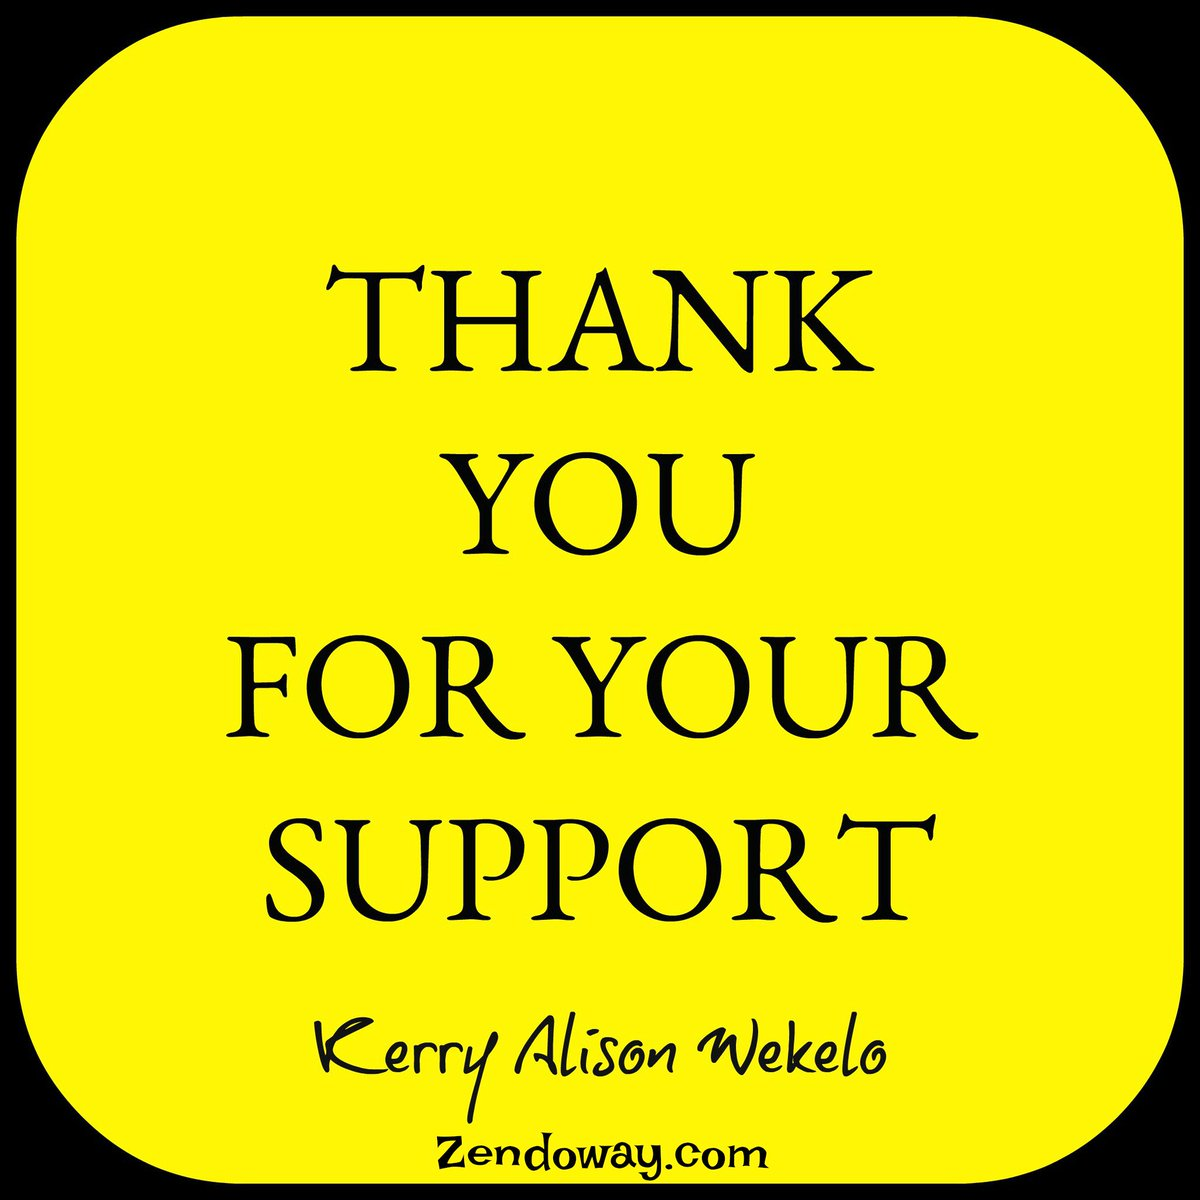 Thank You for your Support @DrNJH23 @tcodat2 @joblify_app @actualizellc @WessnerCharles @cretedeepsea @Dra_TeraizaMesa @MrsPecksPeeps @TotTails @FettKeven @stephenkelley85 @TechTOSAGina @JobiTheLab @ChrisQuinn64 @DrMBEdmunds<br>http://pic.twitter.com/7YCn2oD5lU